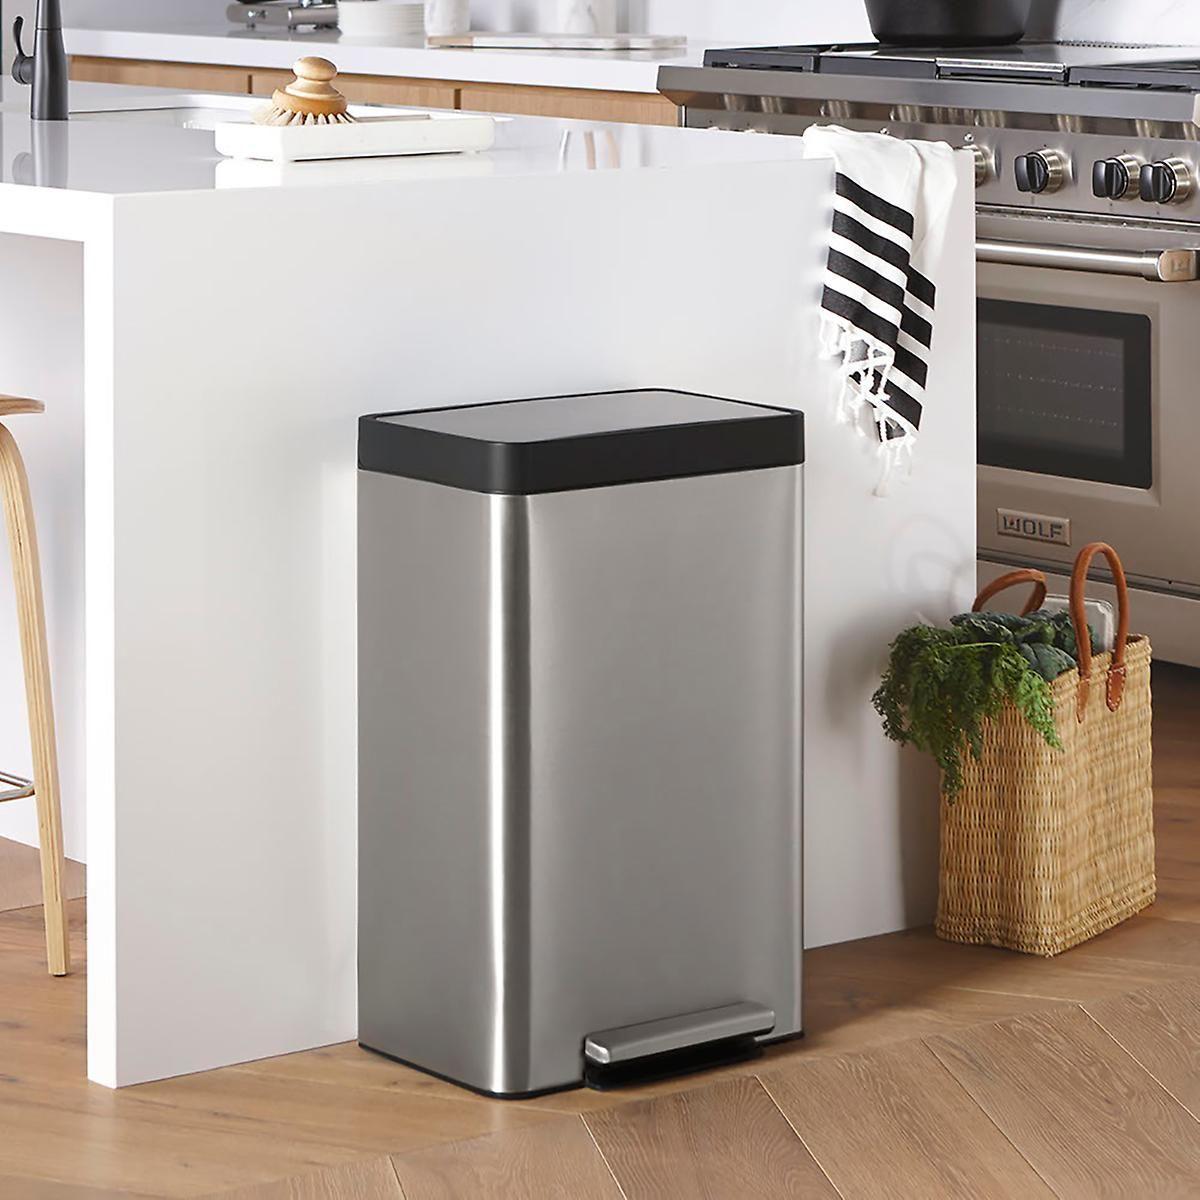 Kohler Stainless Steel 13 Gal Step Trash Can Kitchen Trash Cans